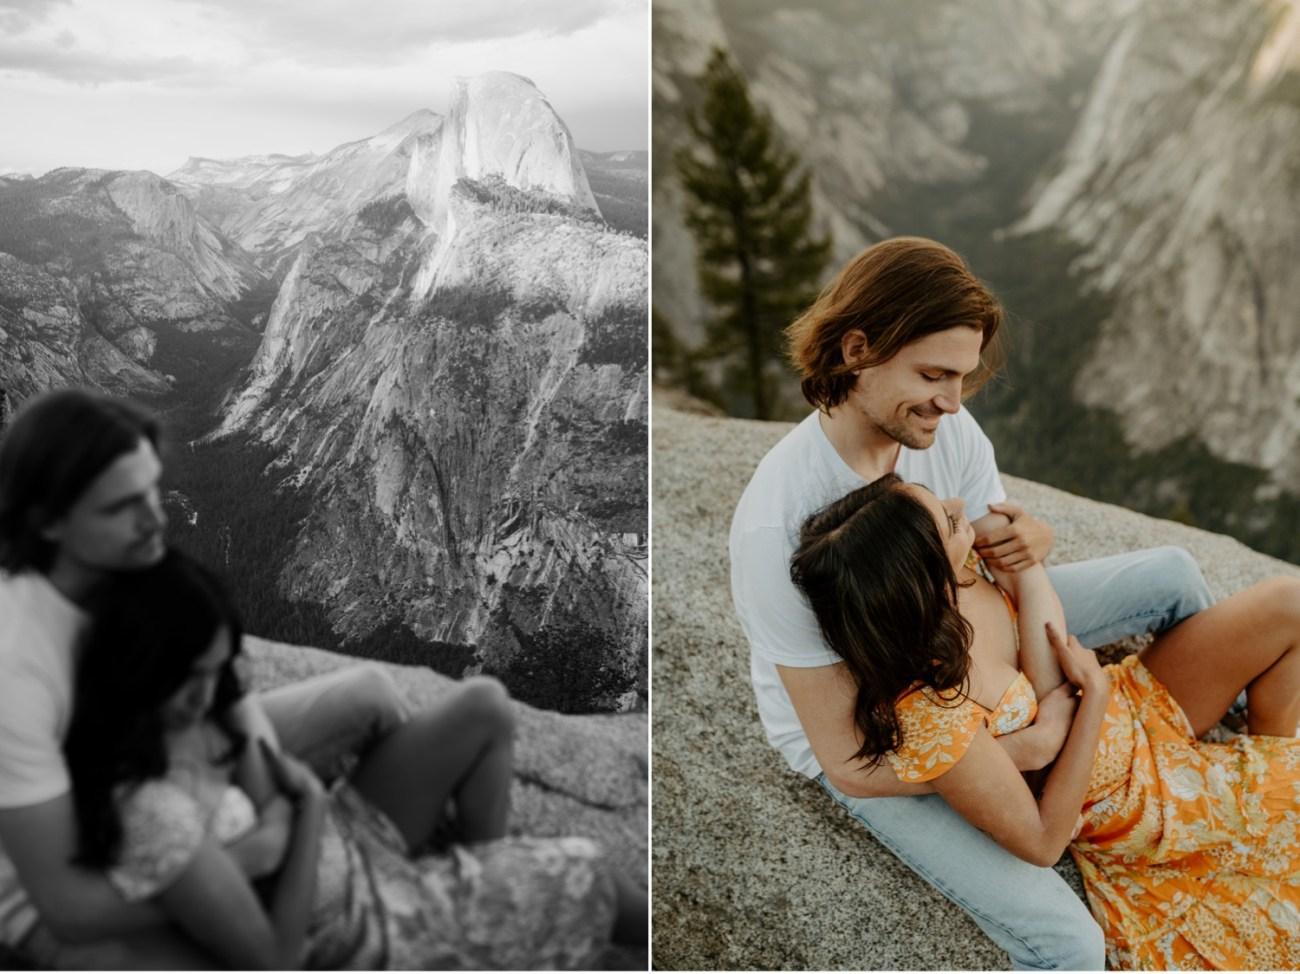 Sunset Yosemite Glacier Point Engagement Session Anais Possamai Photography 24